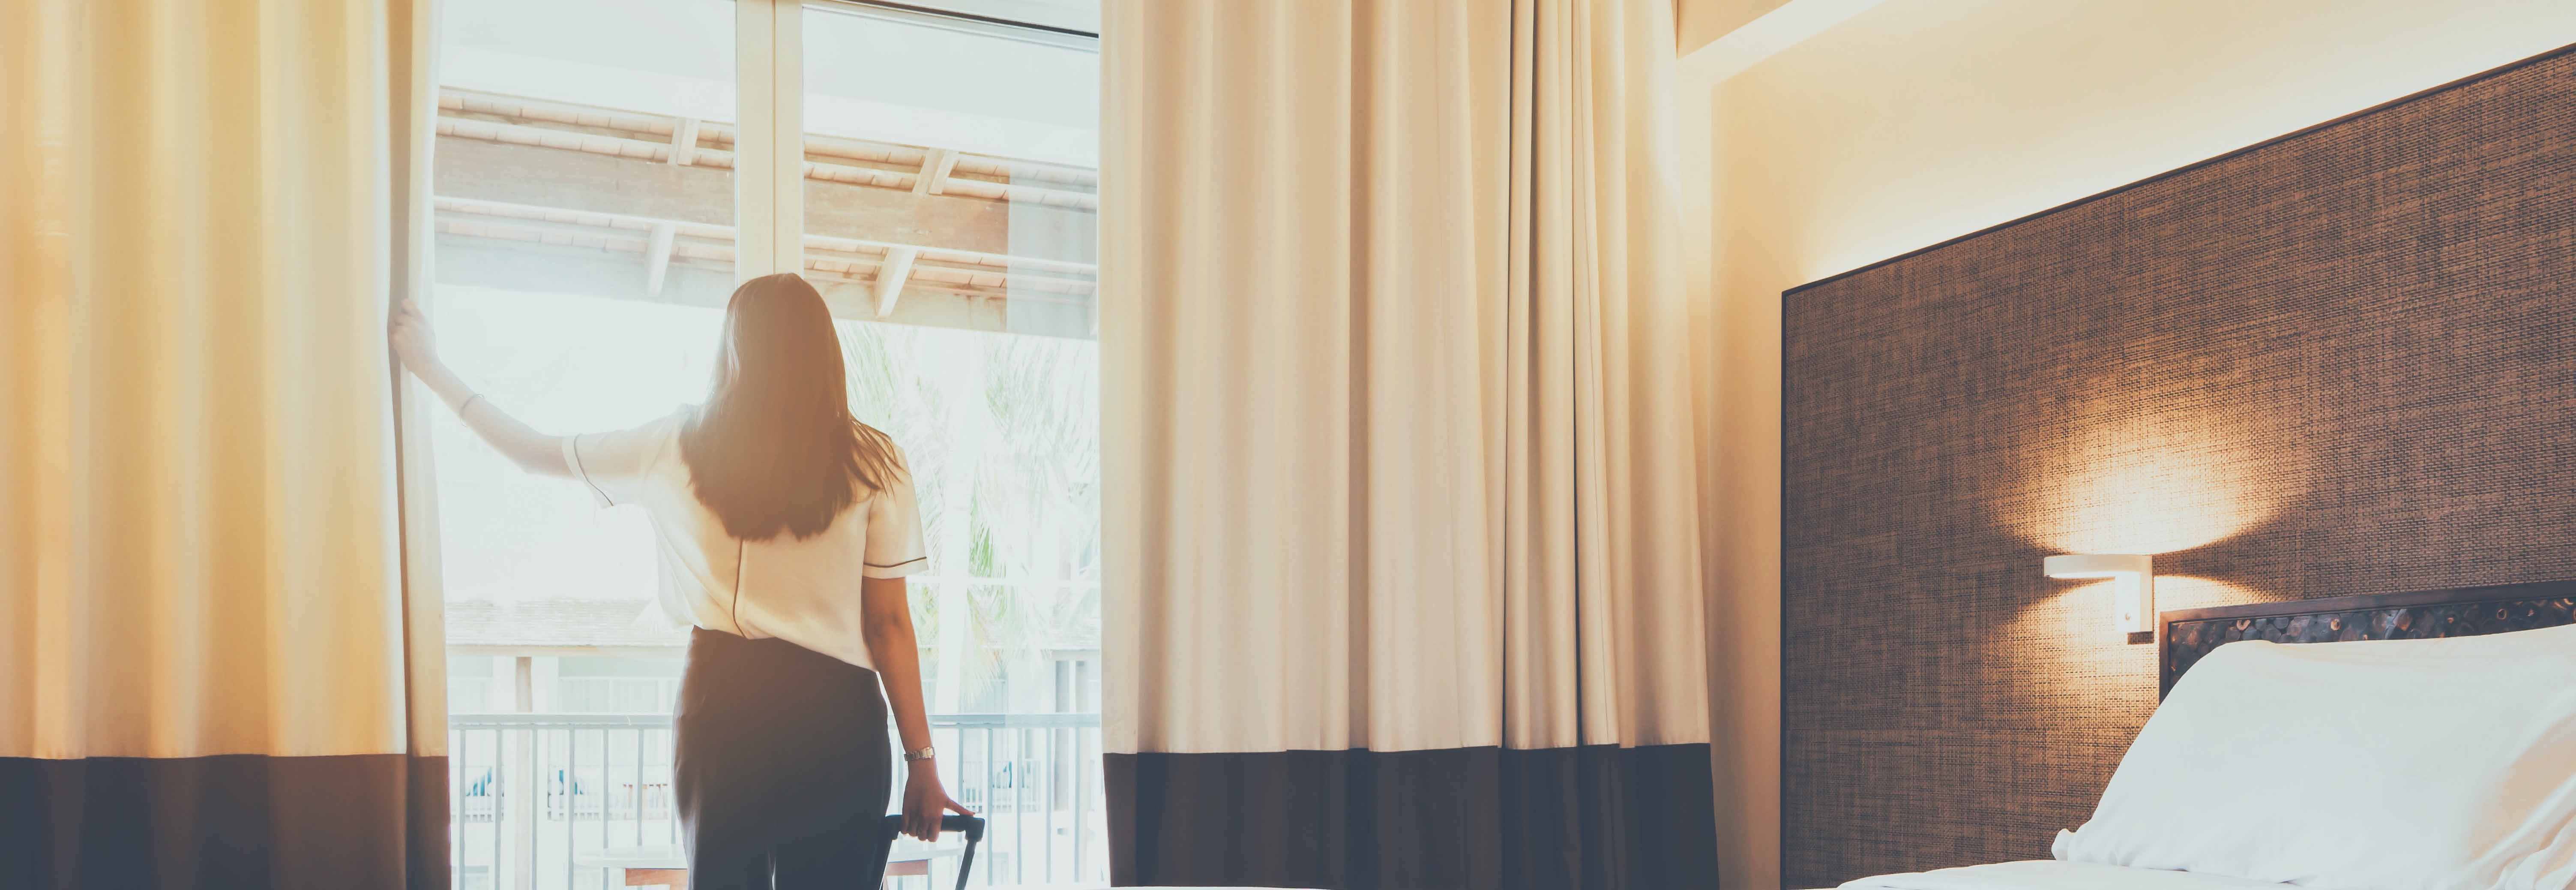 hotel-accommodation-ilc-2020